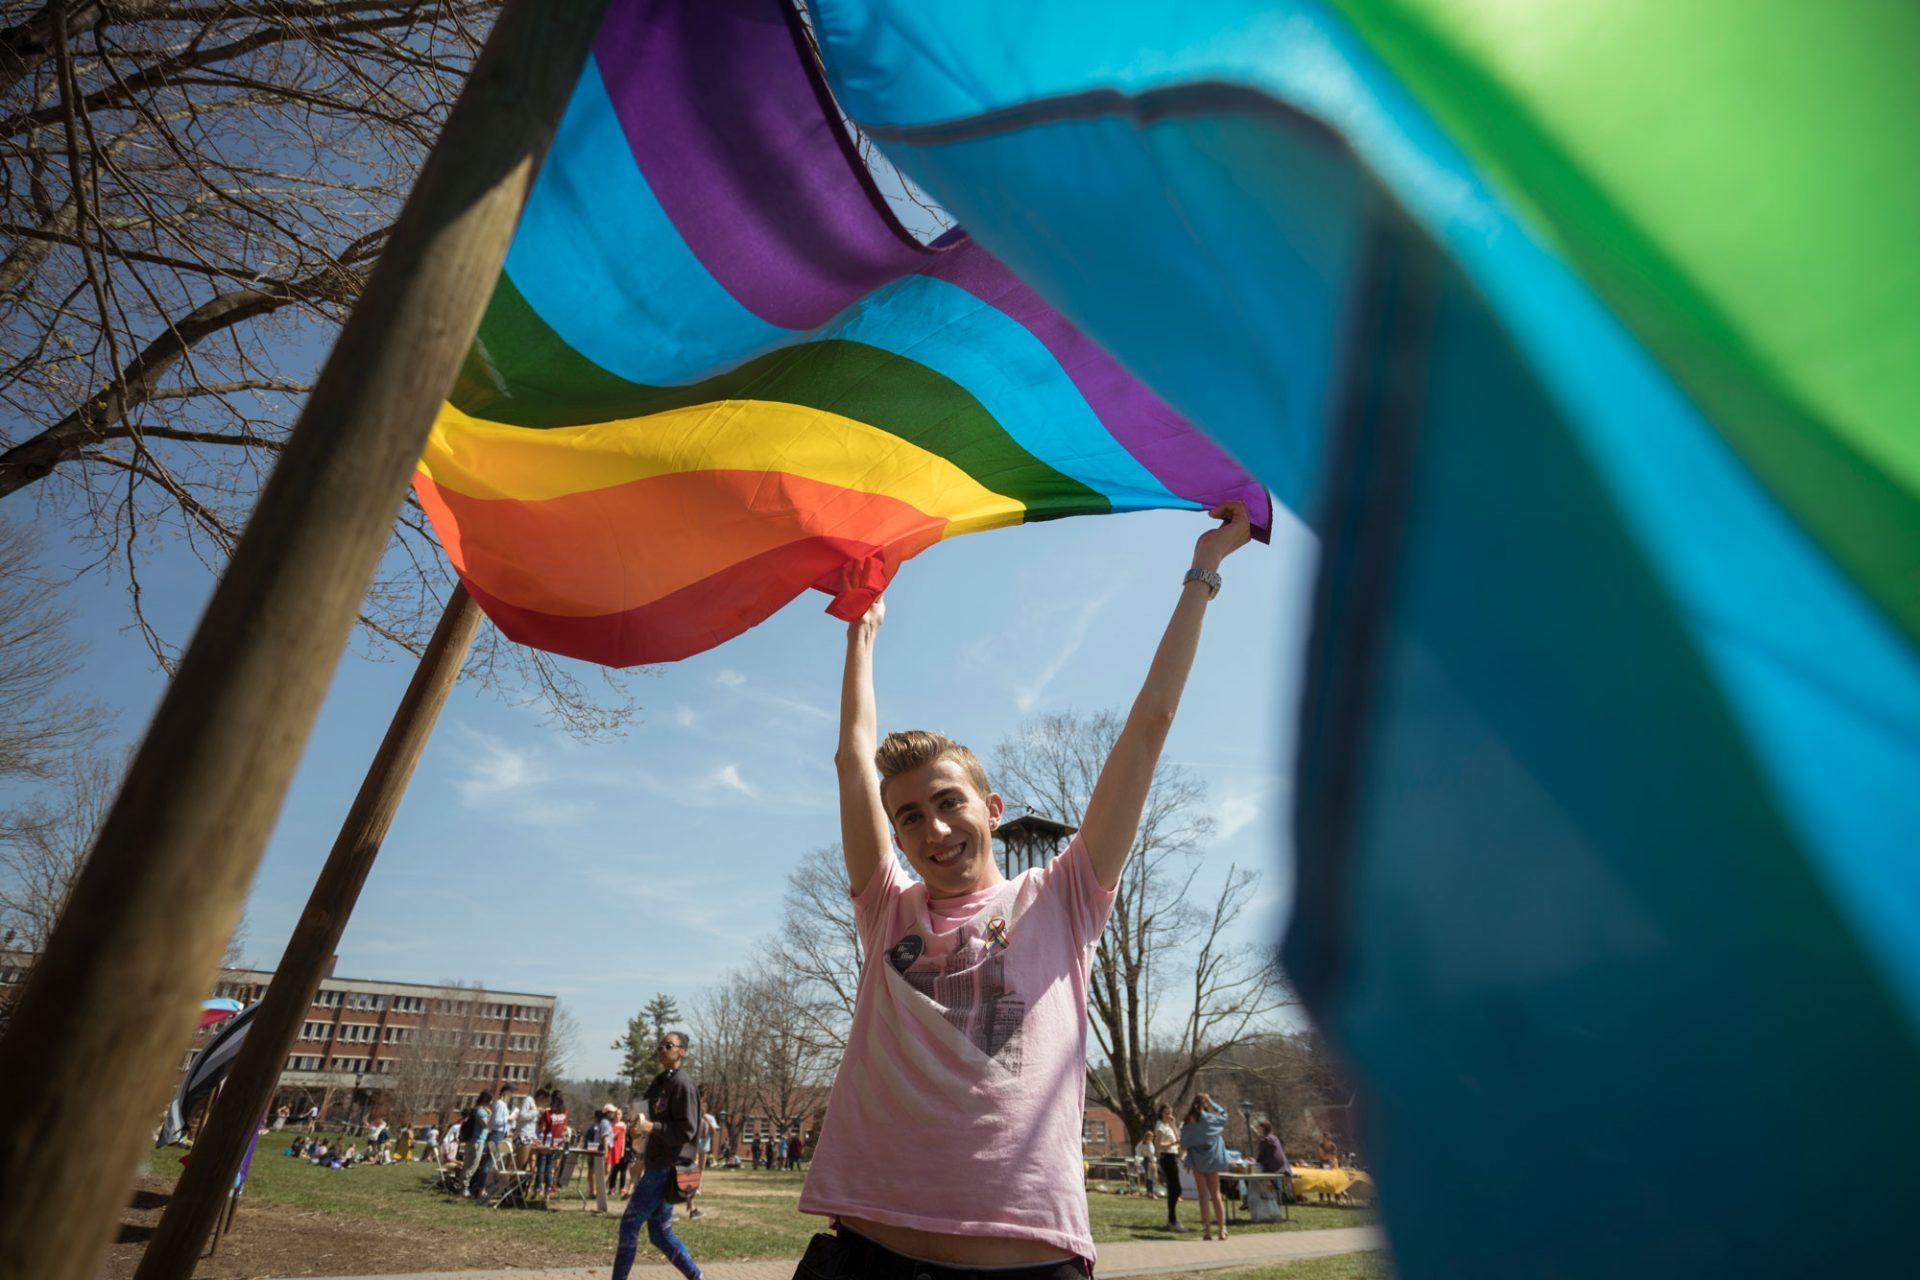 Scott Johnson waves the rainbow flag high on Sanford Mall.